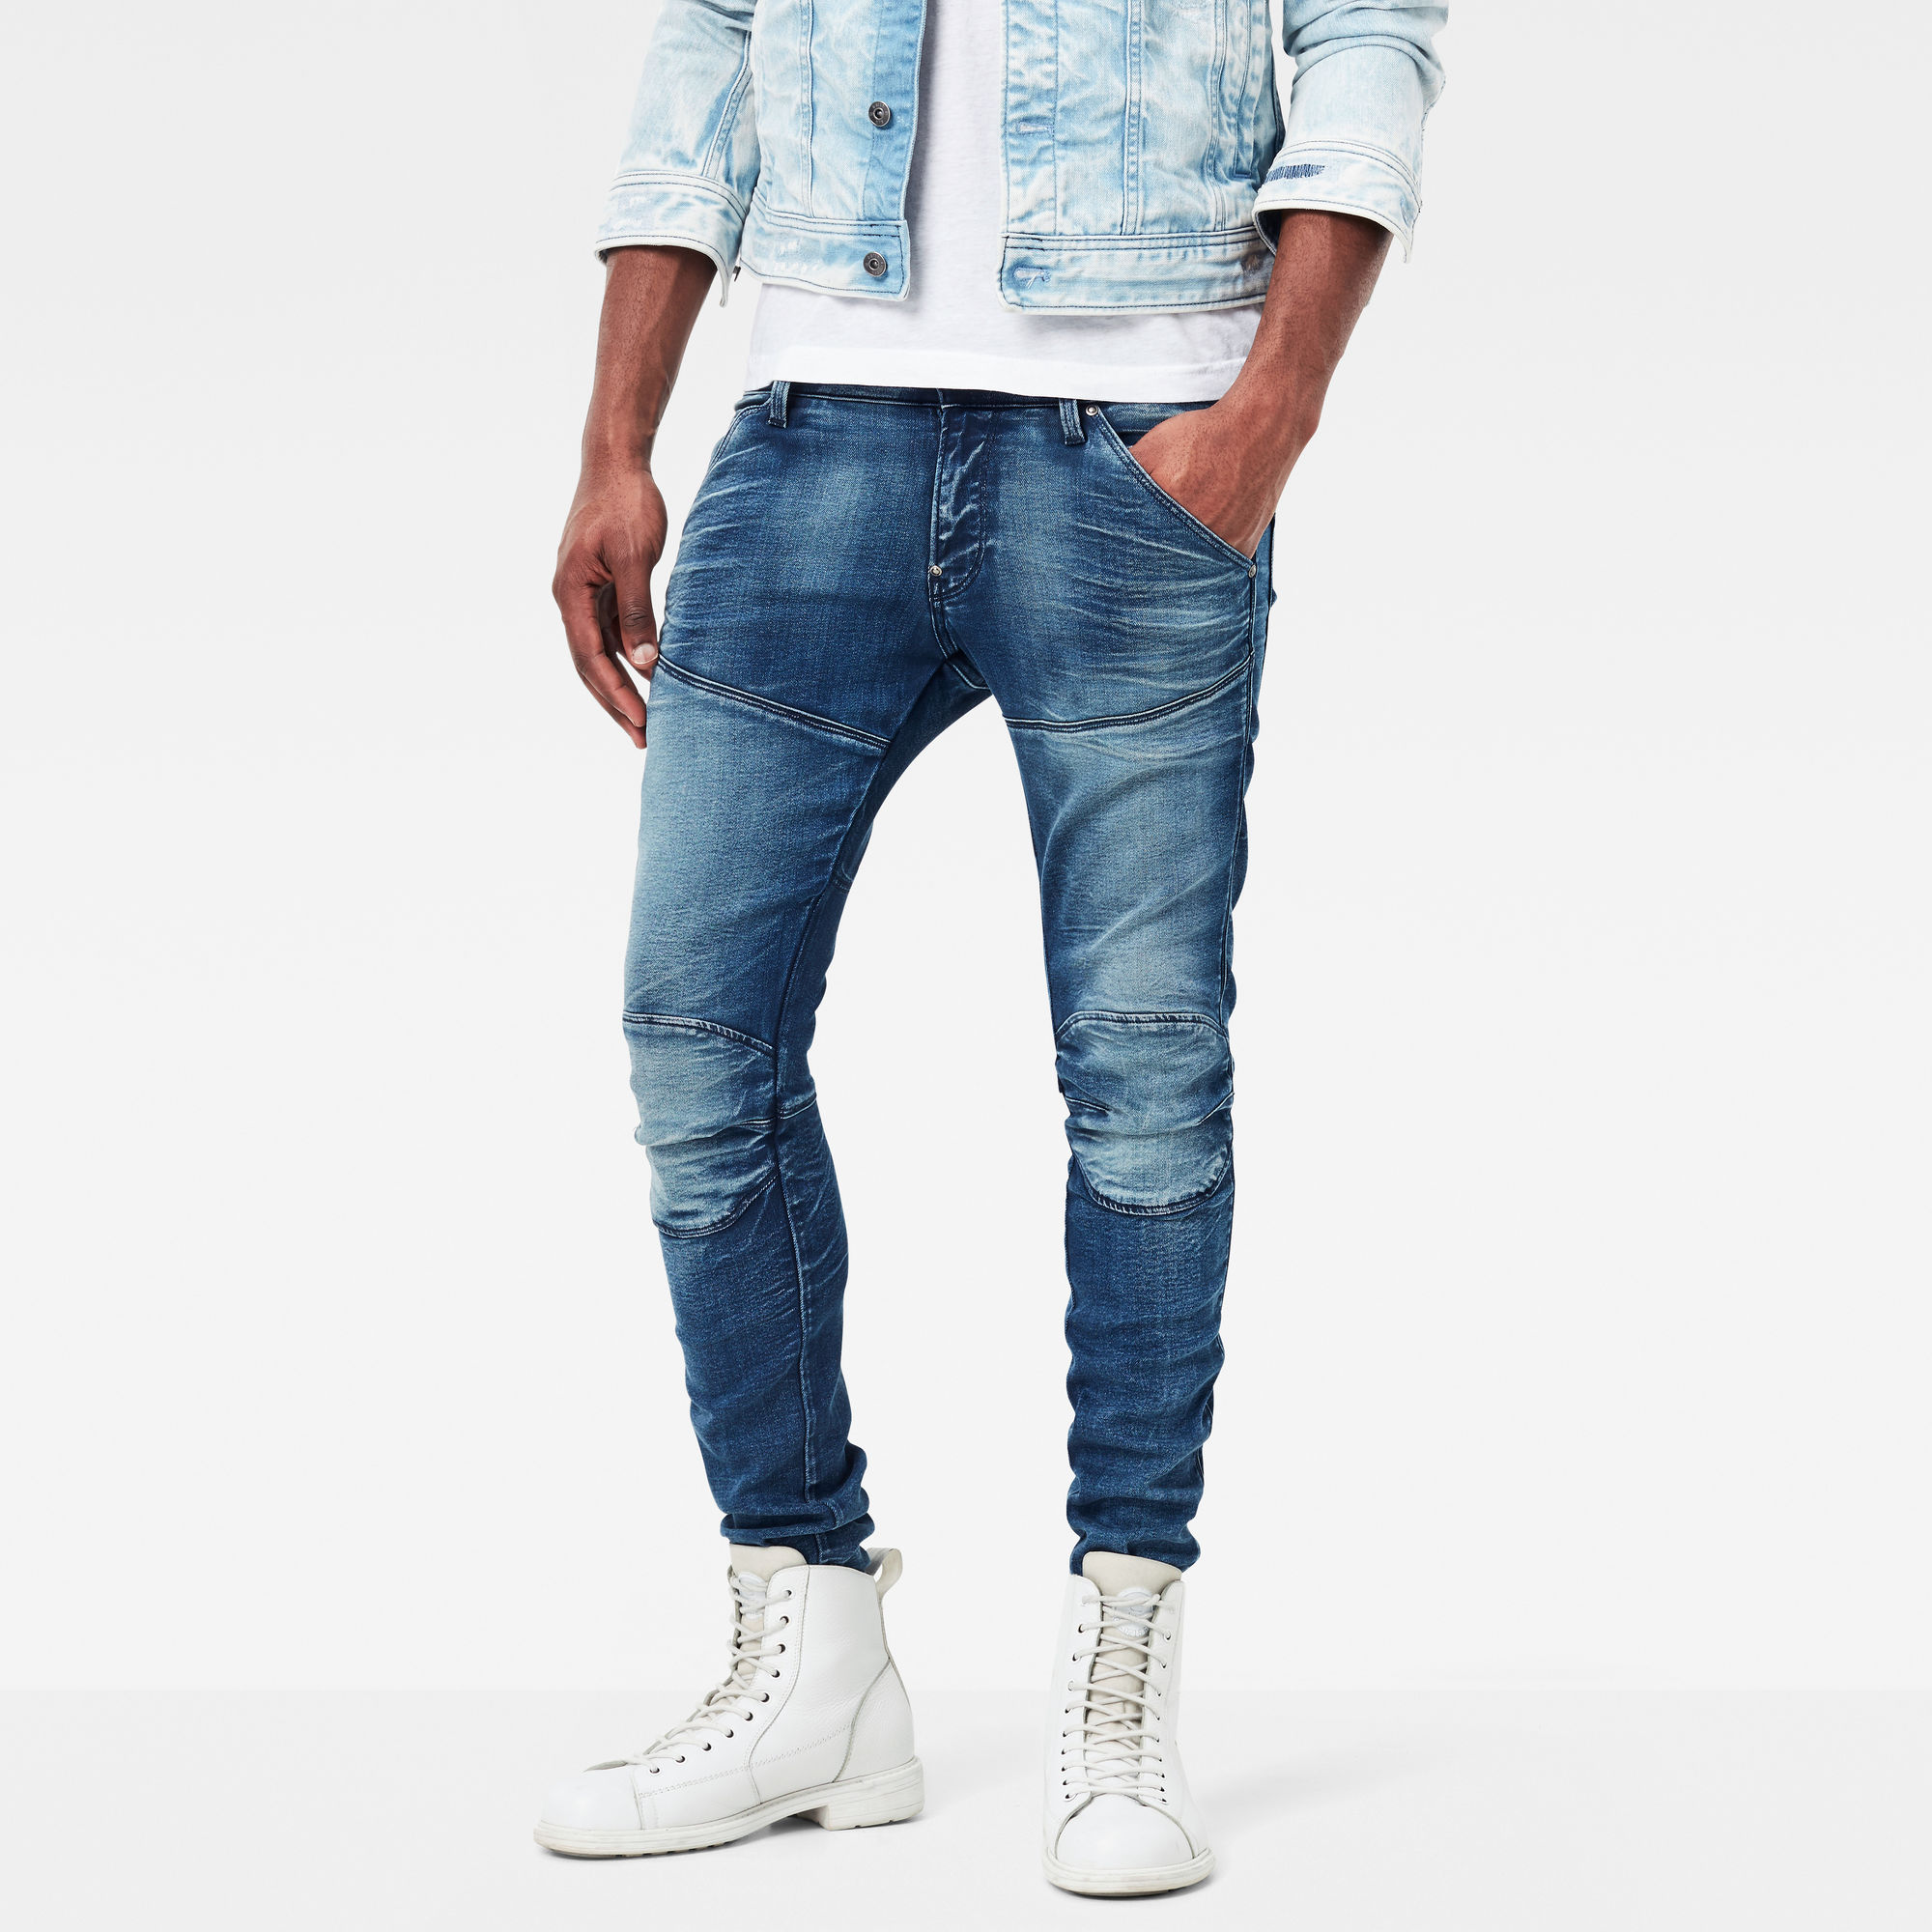 5620 G-Star Elwood 3D Super-Slim Jeans